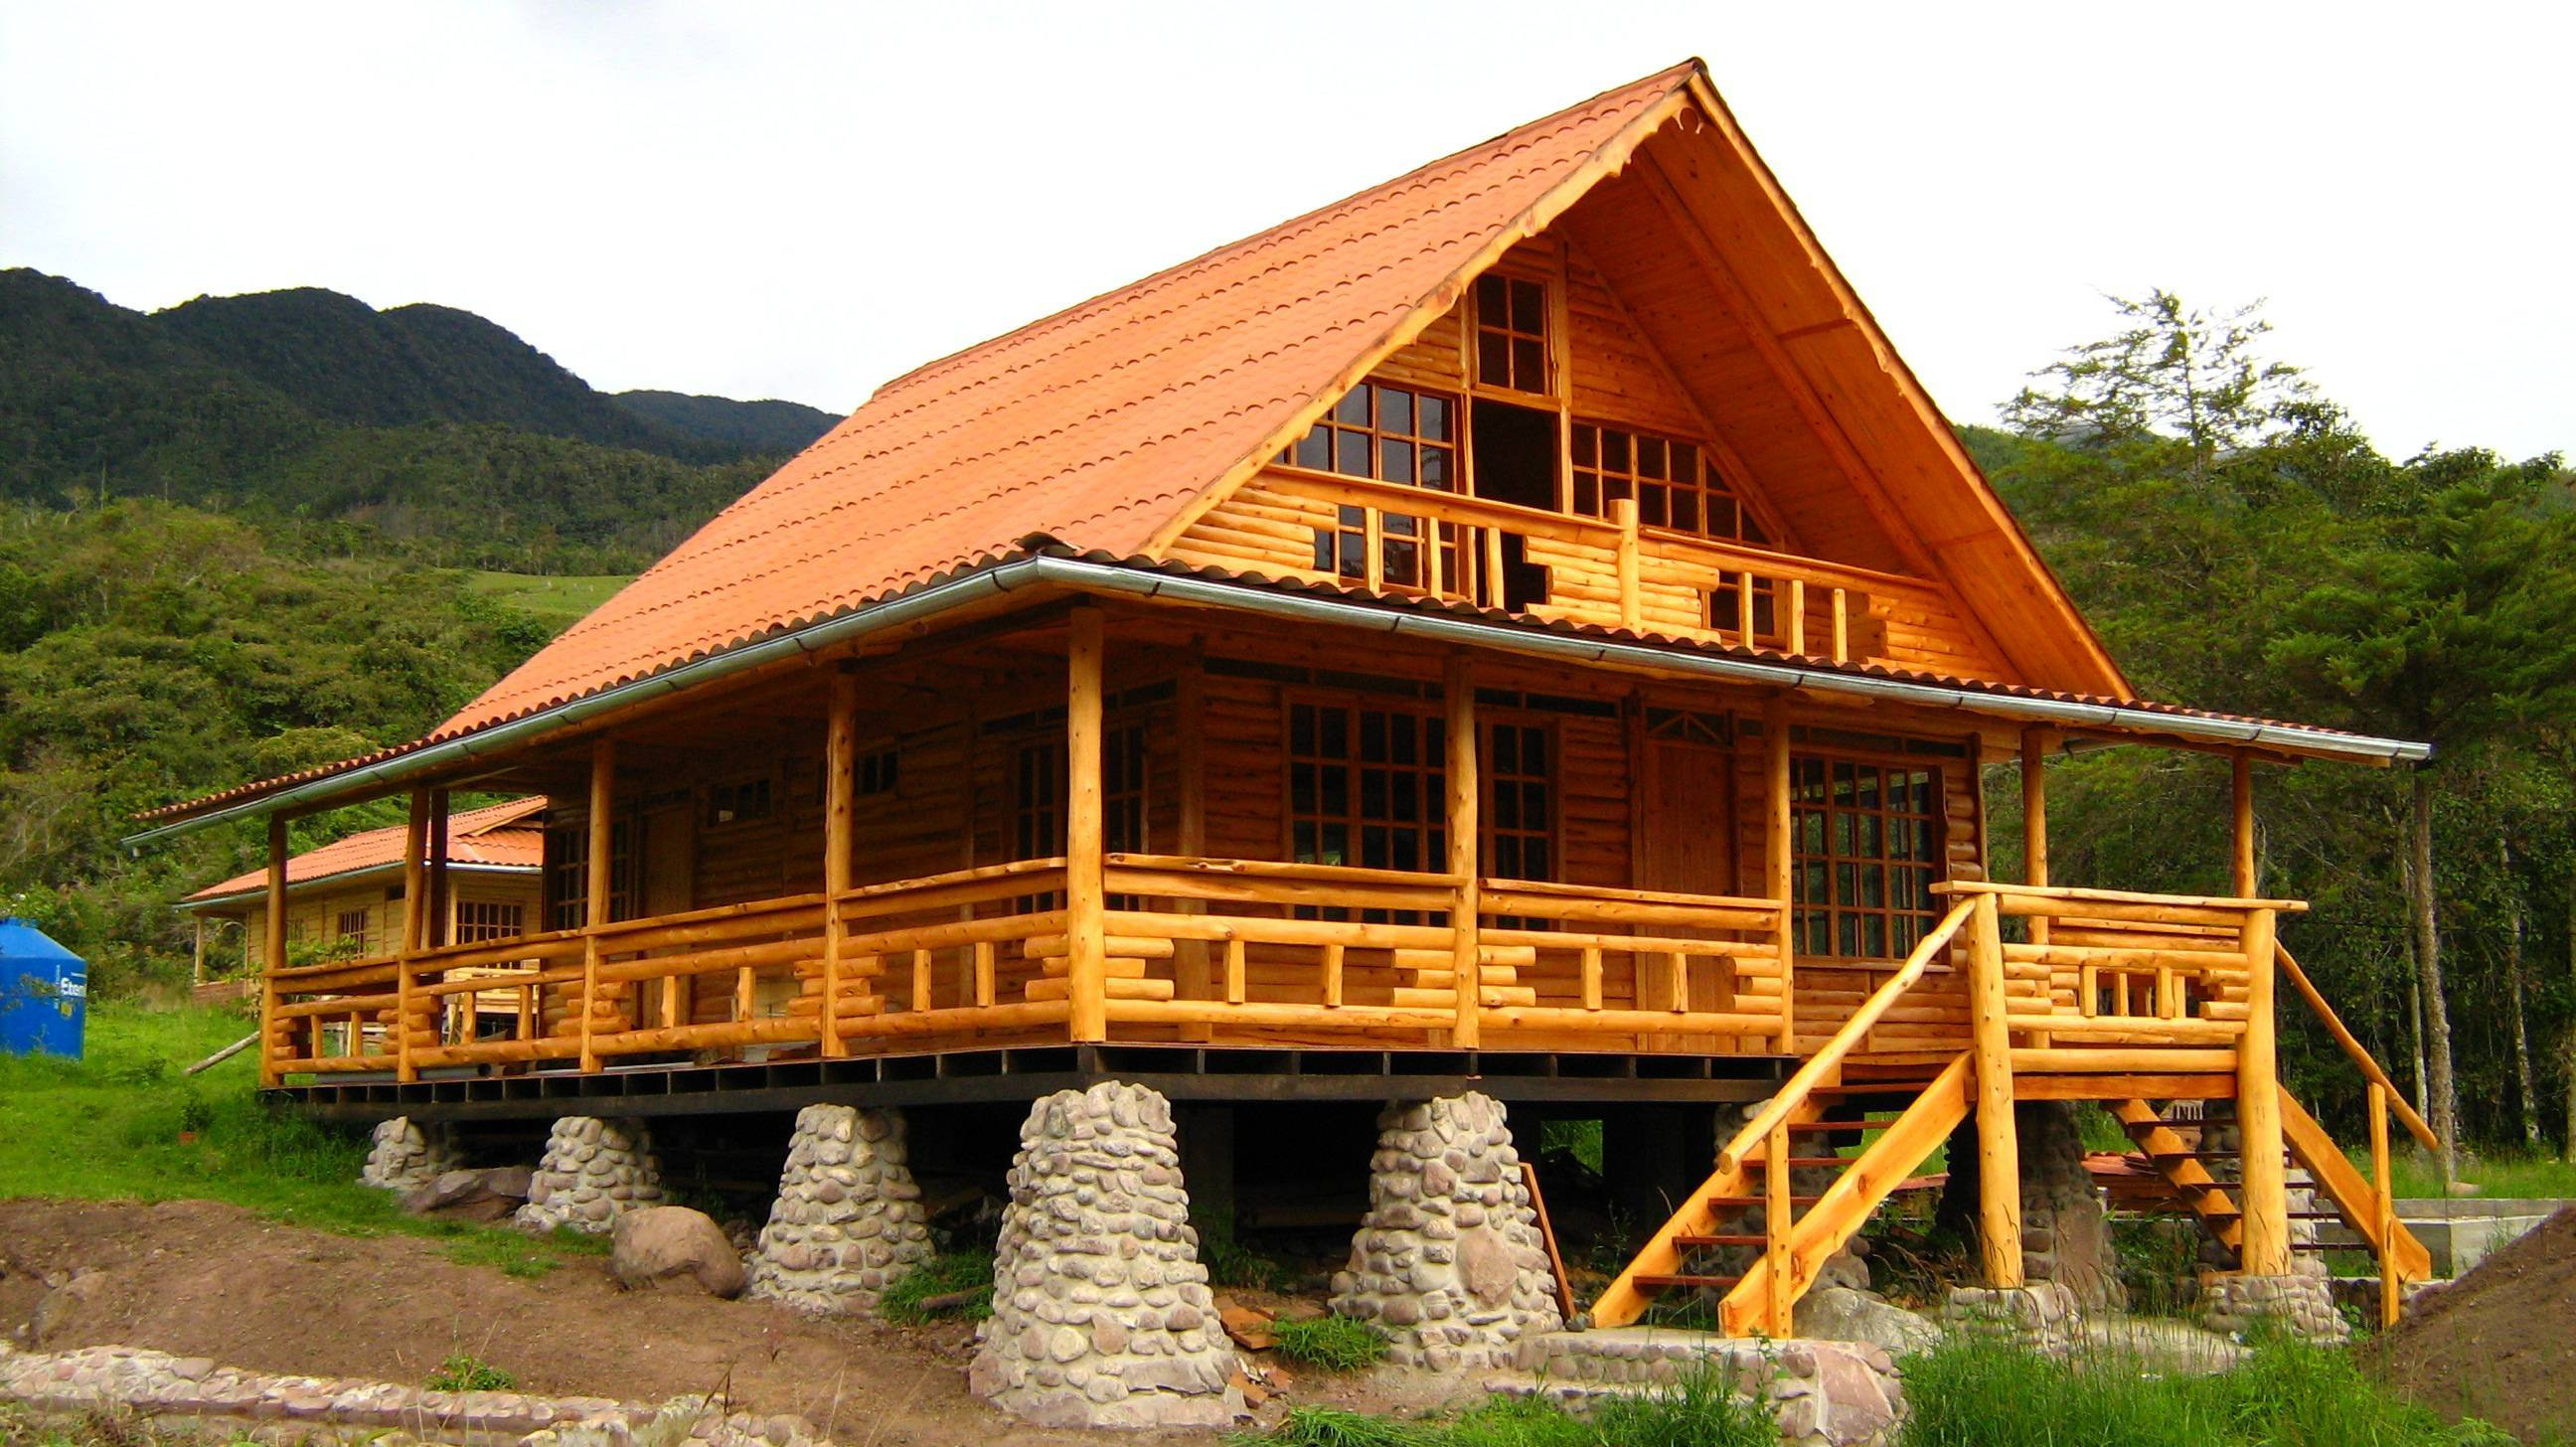 D tronco oxapampa - Fotos de bungalows de madera ...